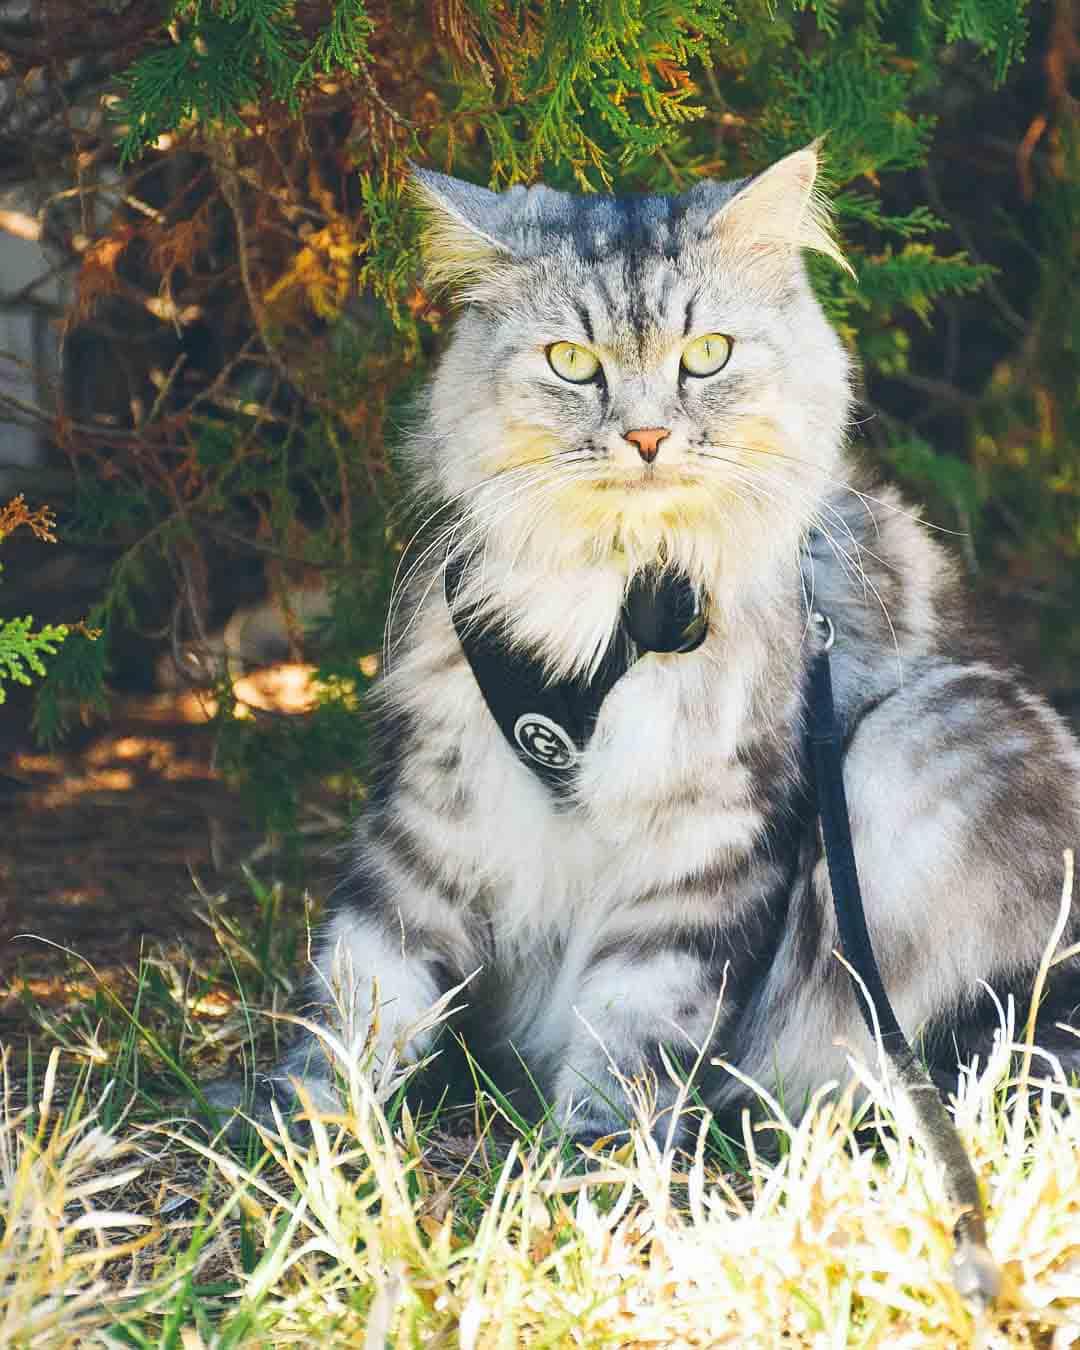 Instagram: @shishi.haku.lovecats